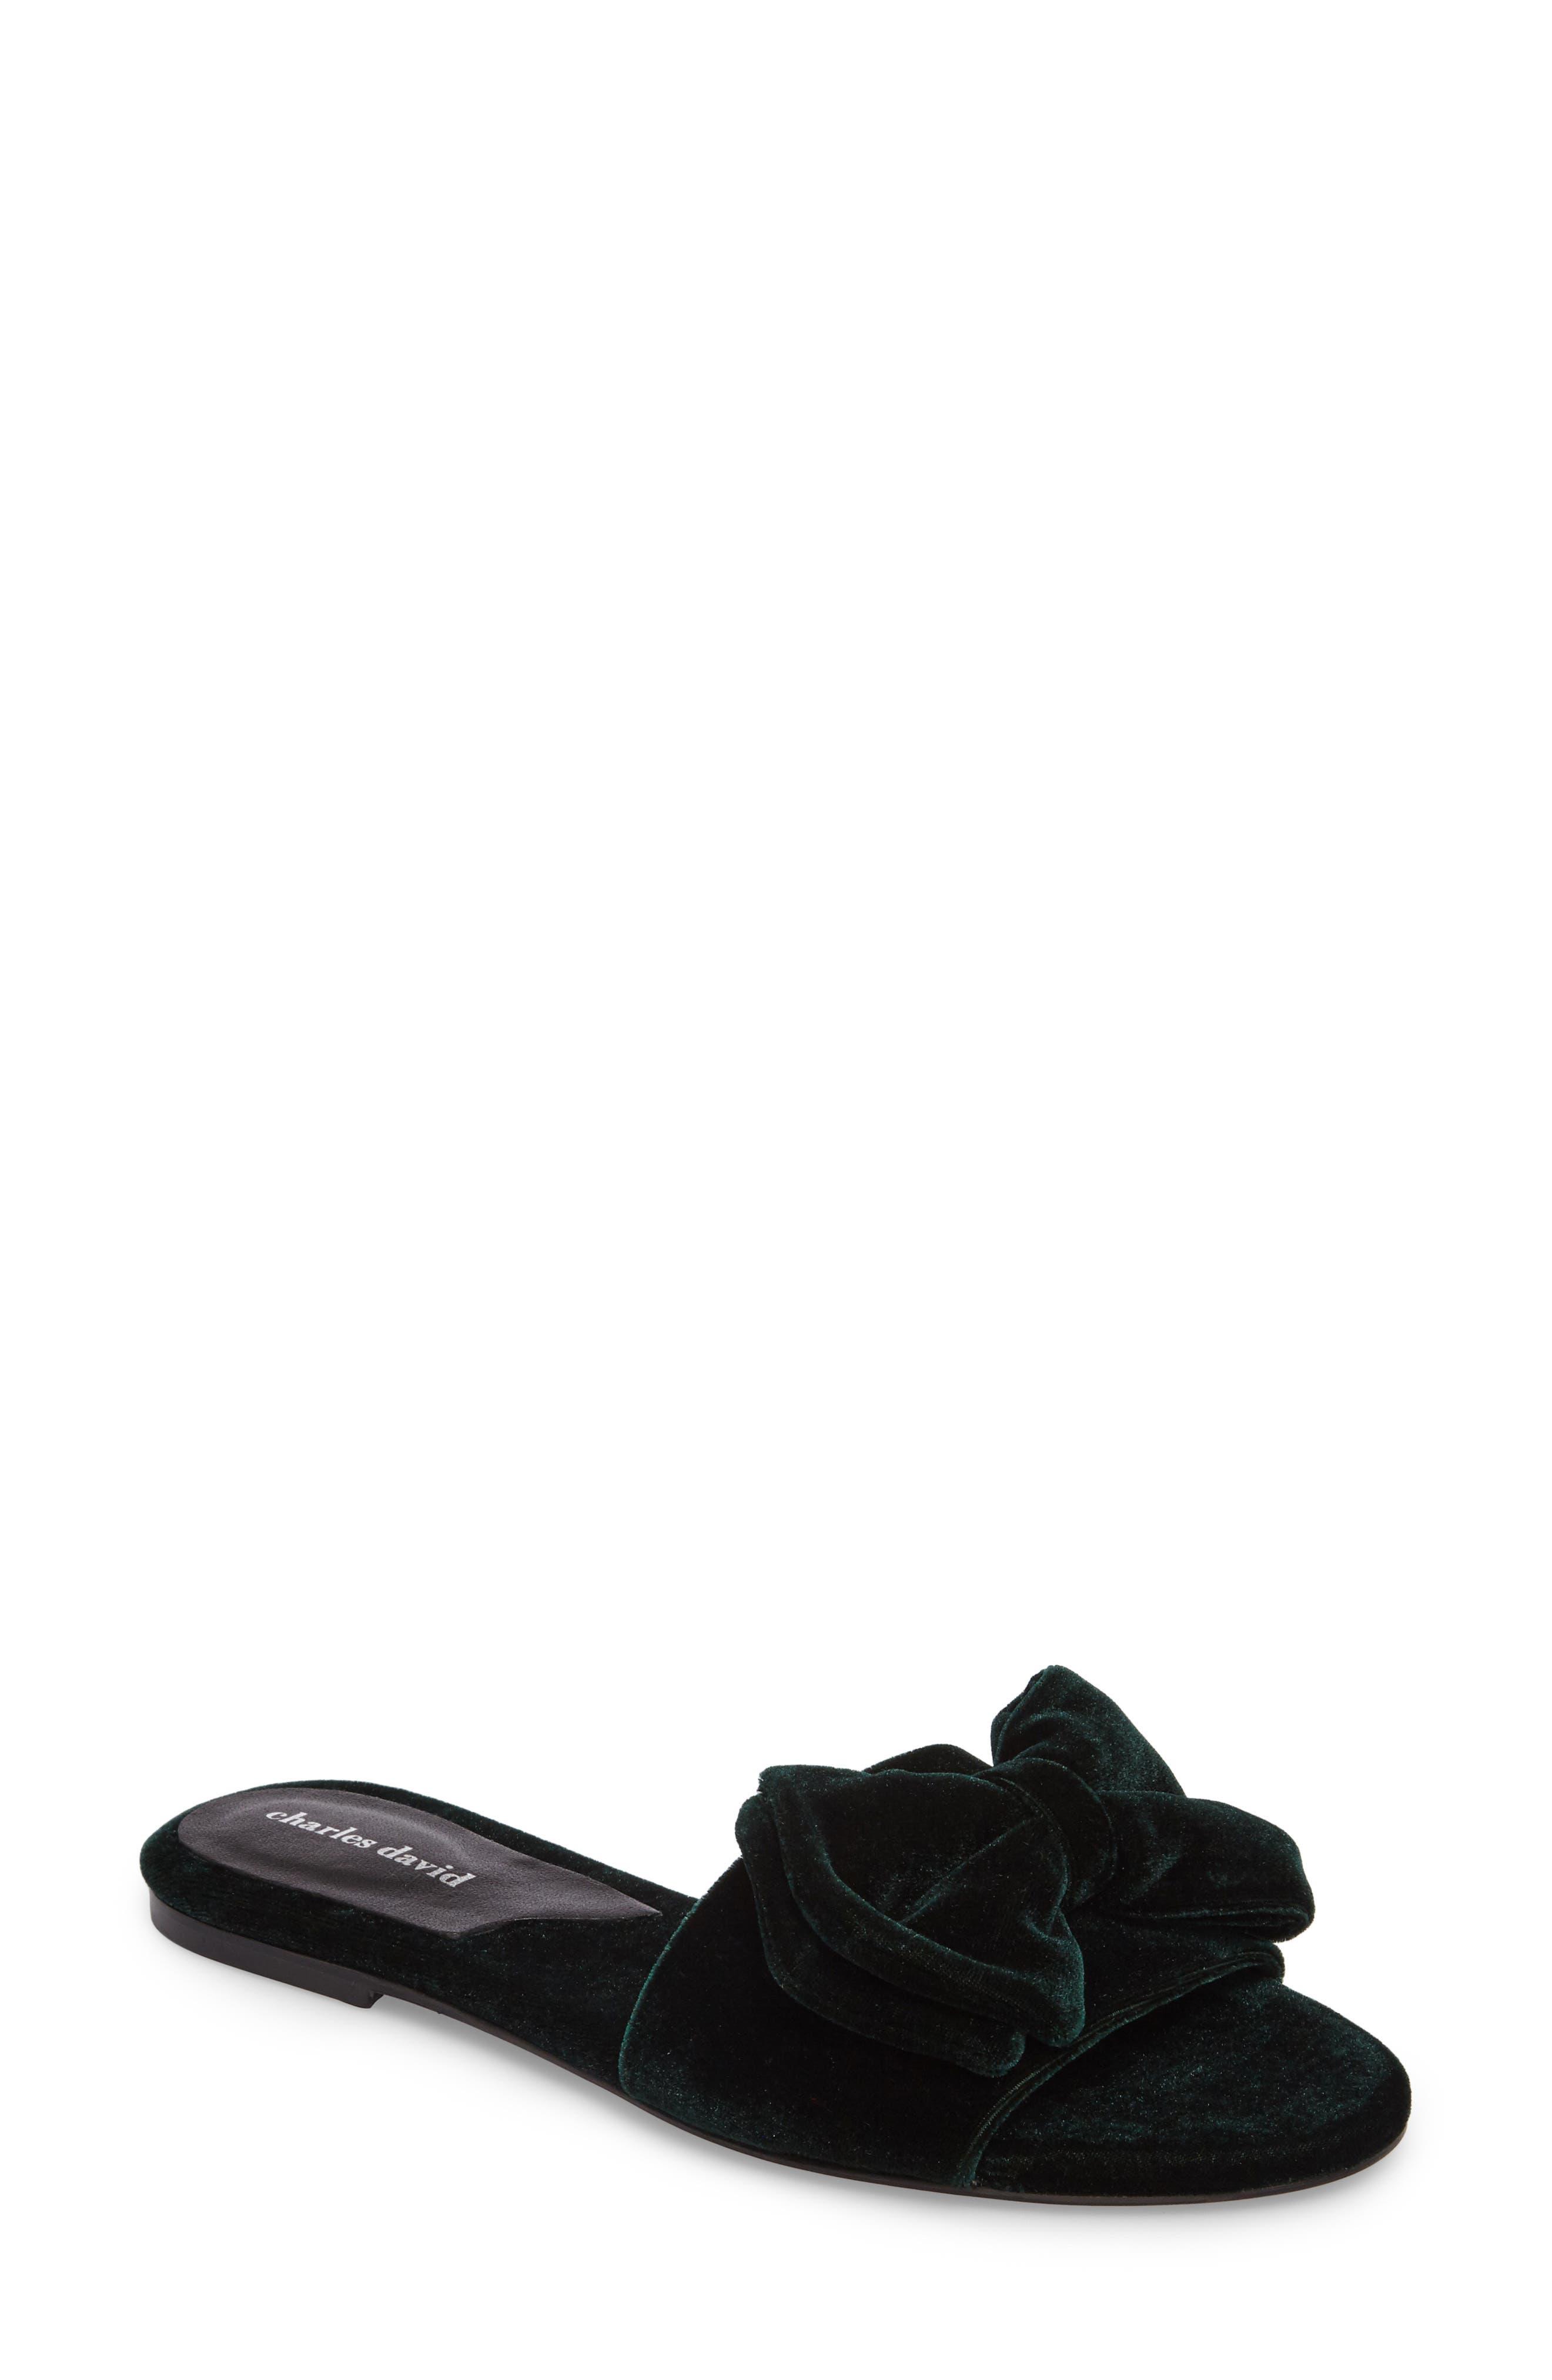 Bow Slide Sandal,                             Main thumbnail 2, color,